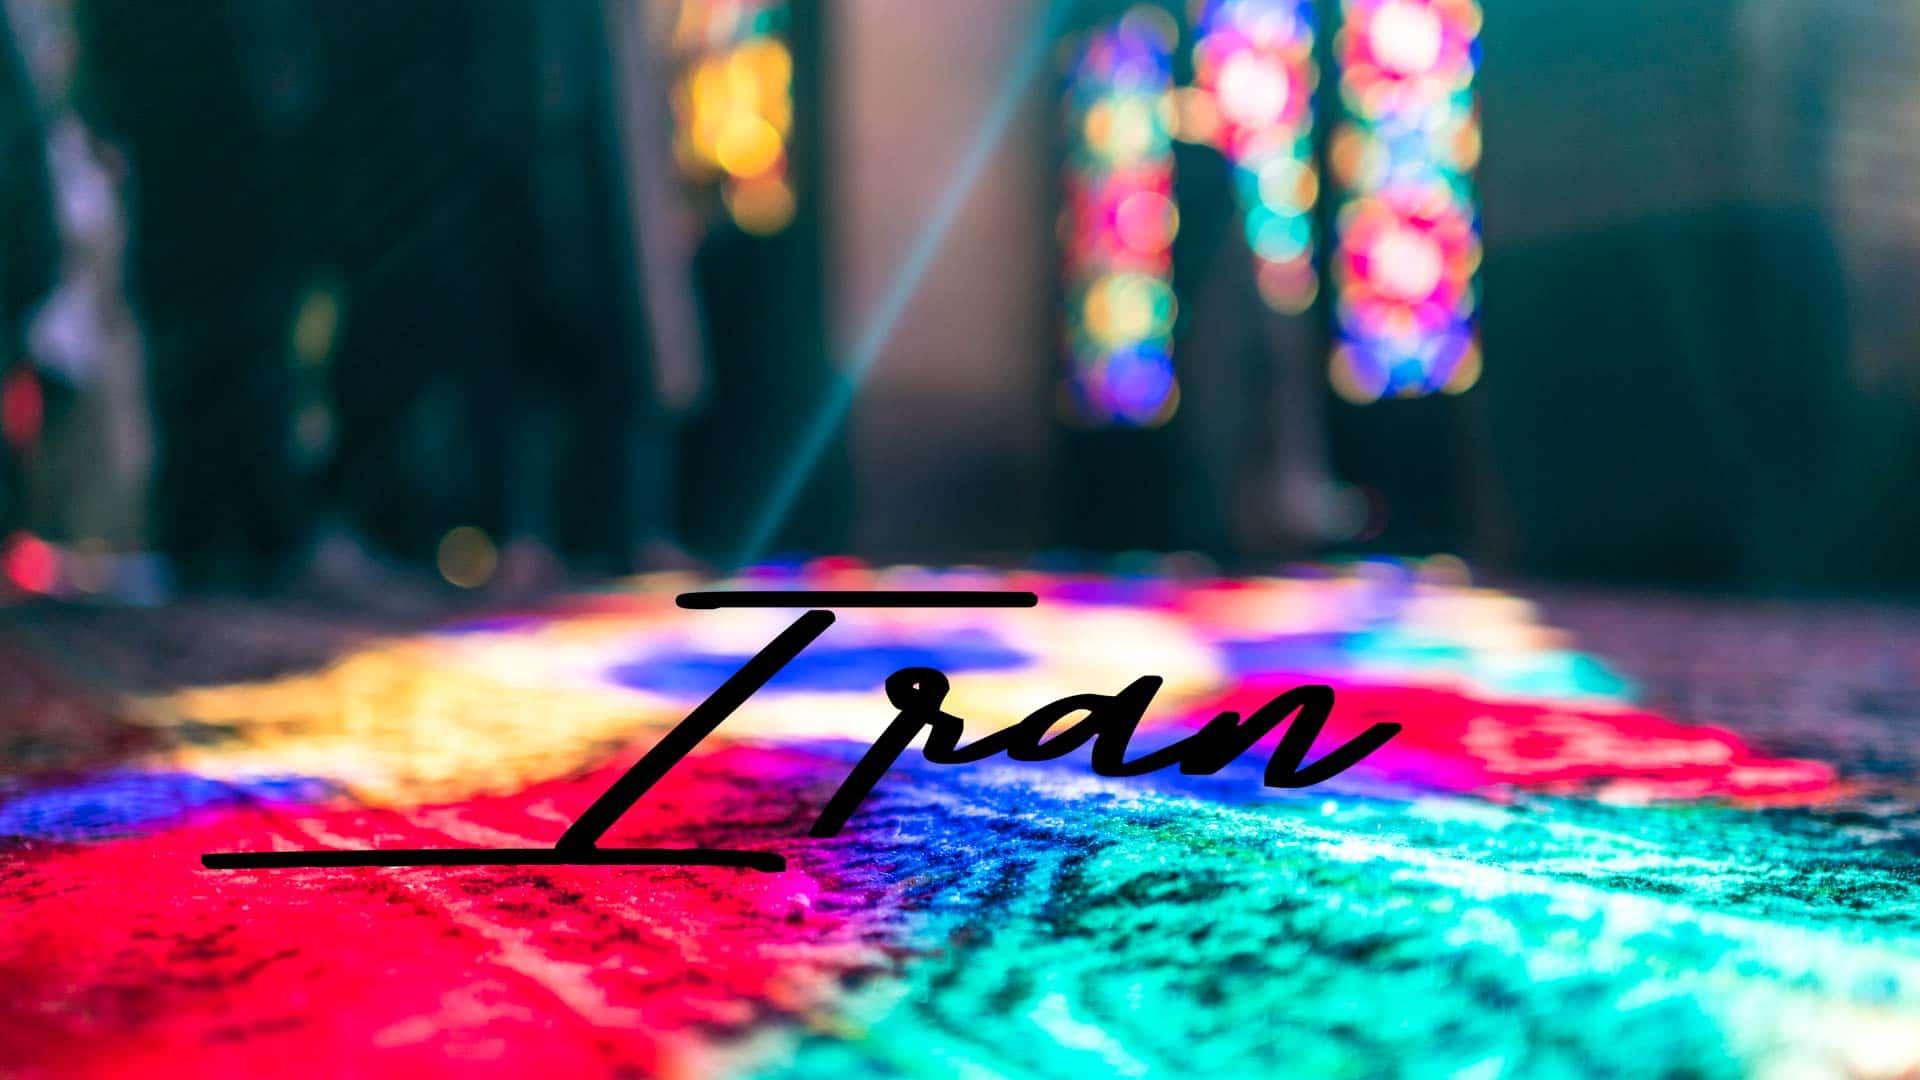 SerialHikers stop autostop world monde tour hitchhiking aventure adventure alternative travel voyage sans avion no fly Iran Chiraz Shiraz pink mosque mosquée